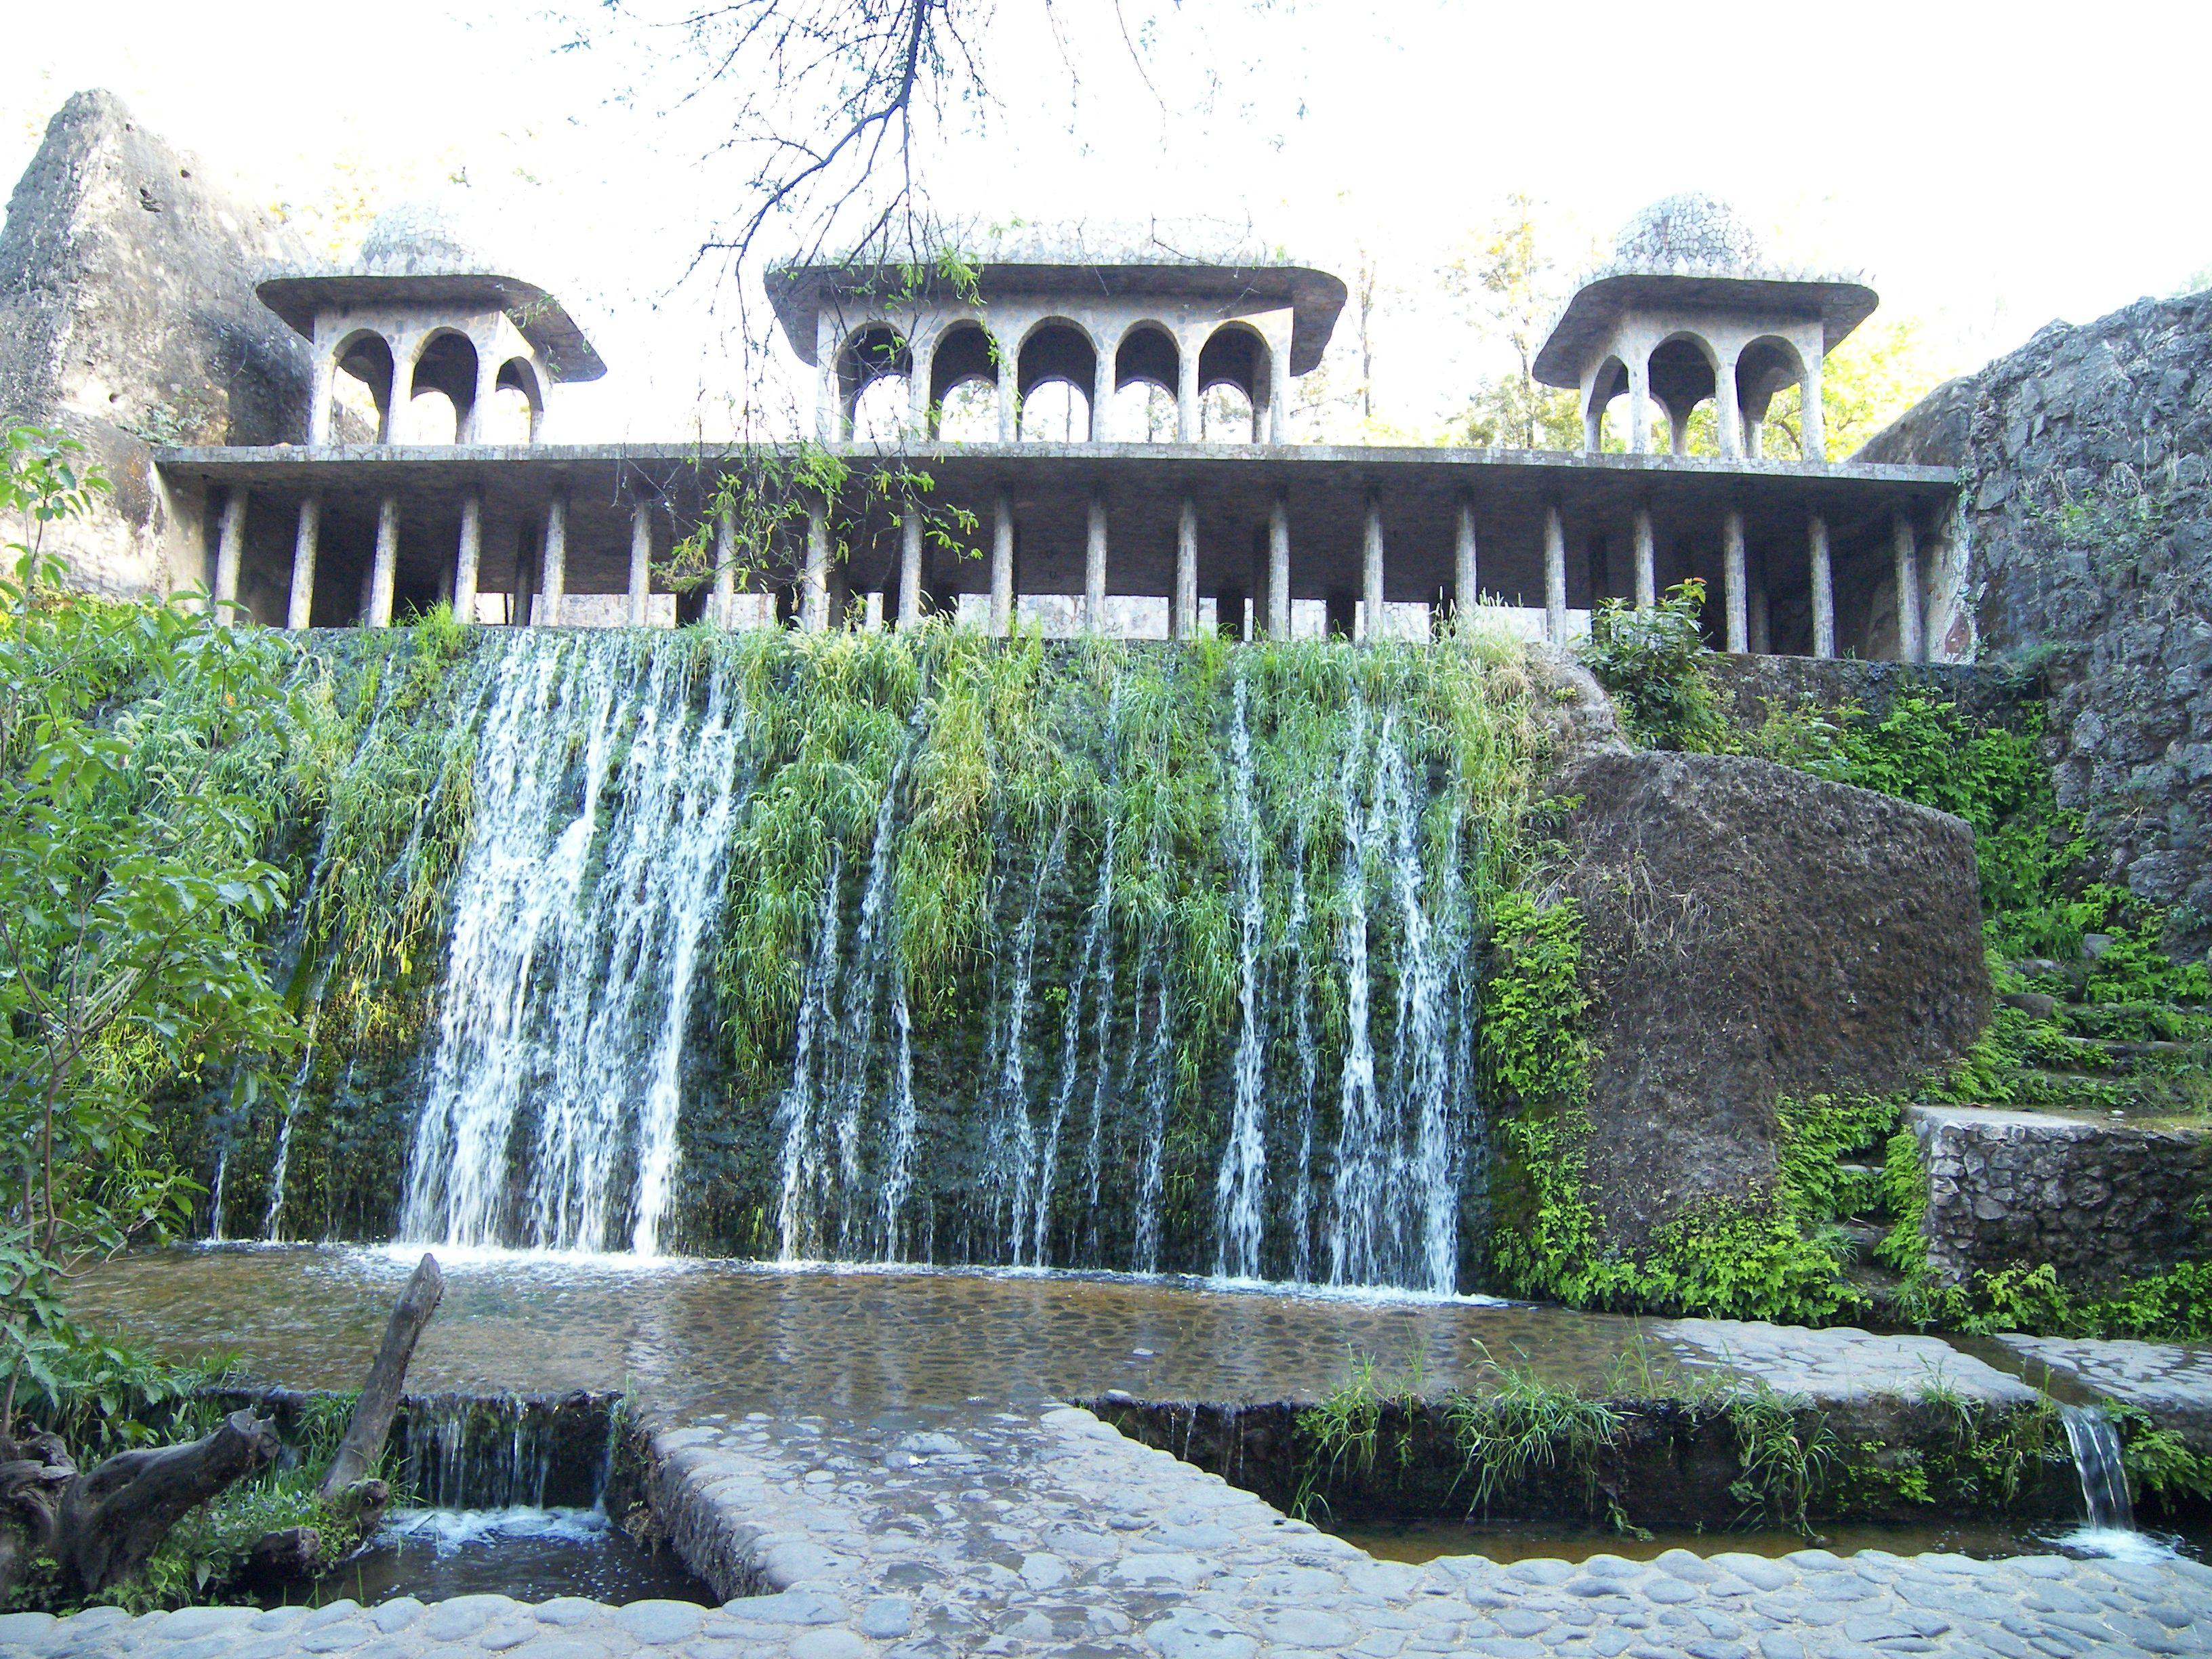 Chandigarh Rock Garden Hd Wallpaper India Holidays Travel